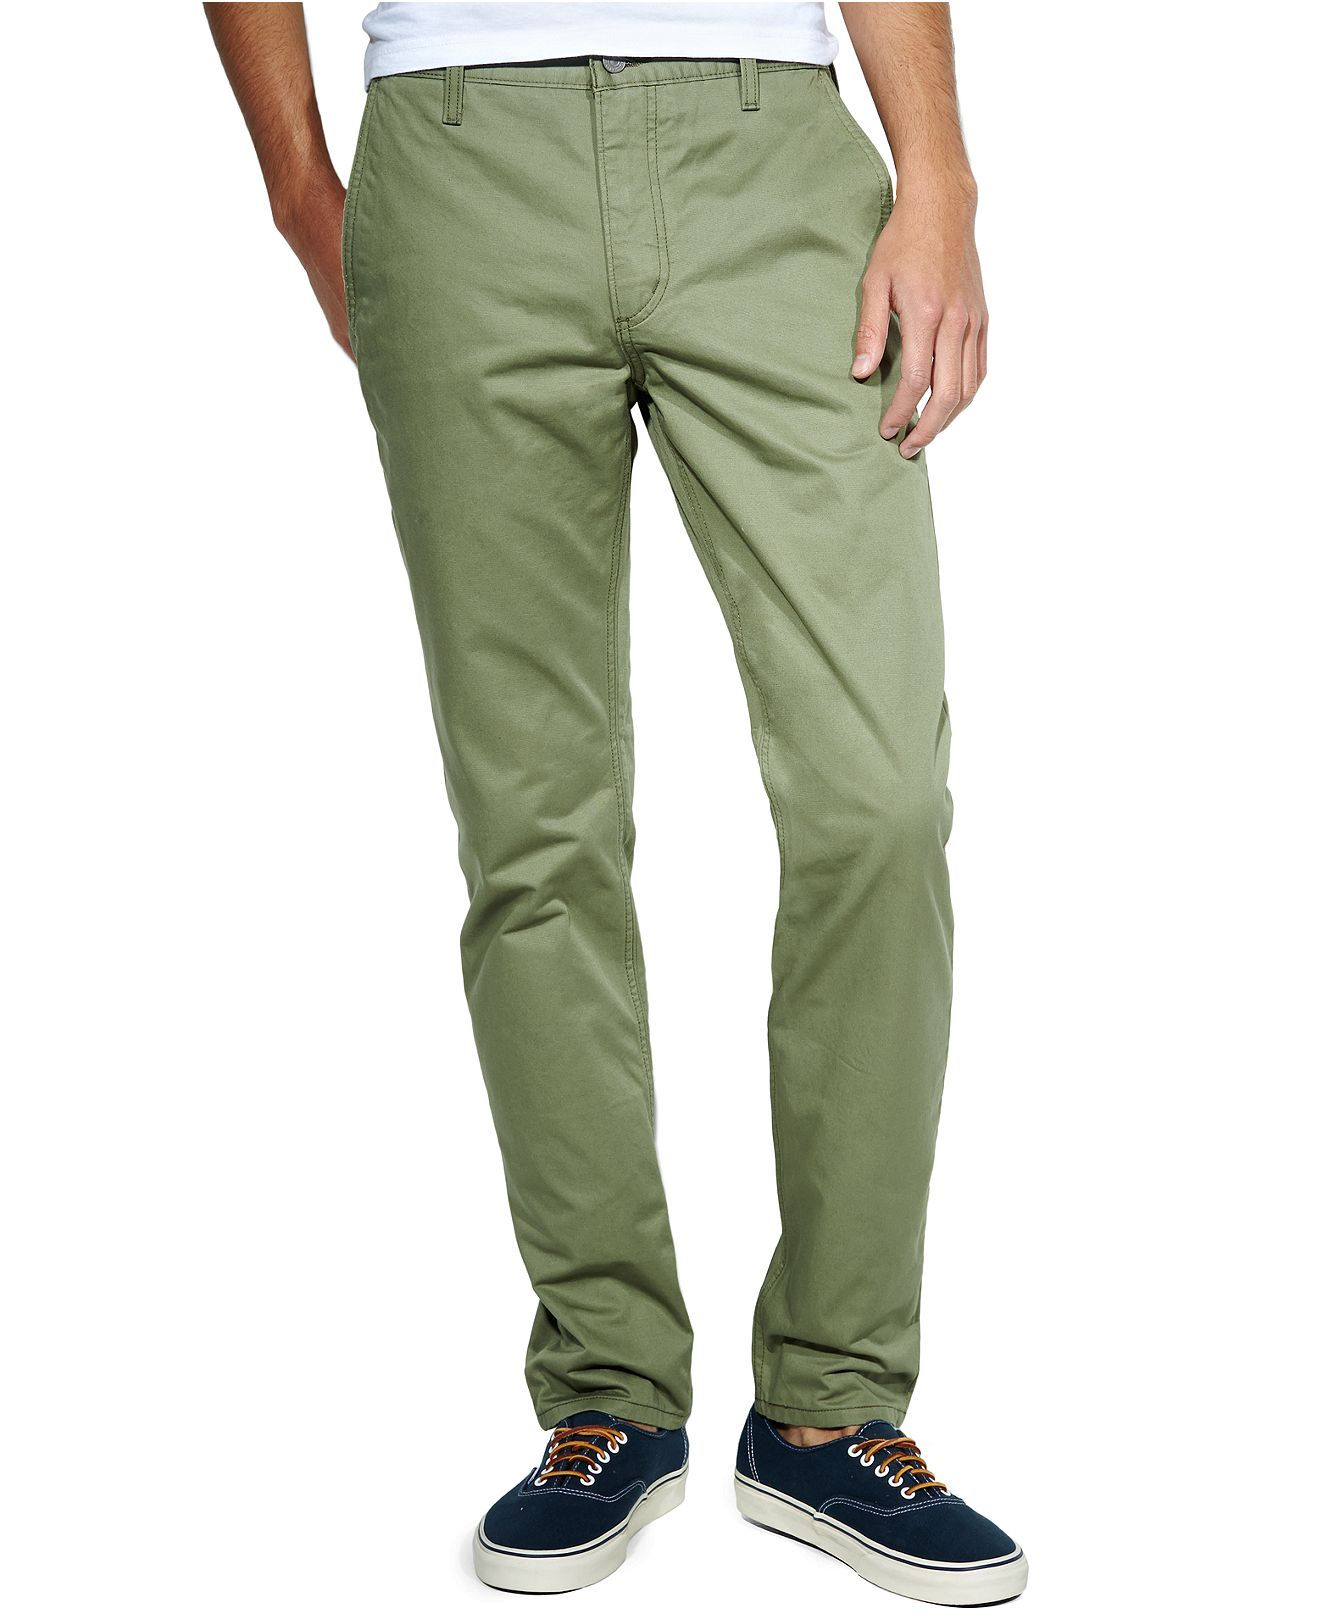 Levis 511 slim fit hybrid trousers in deep lichen green